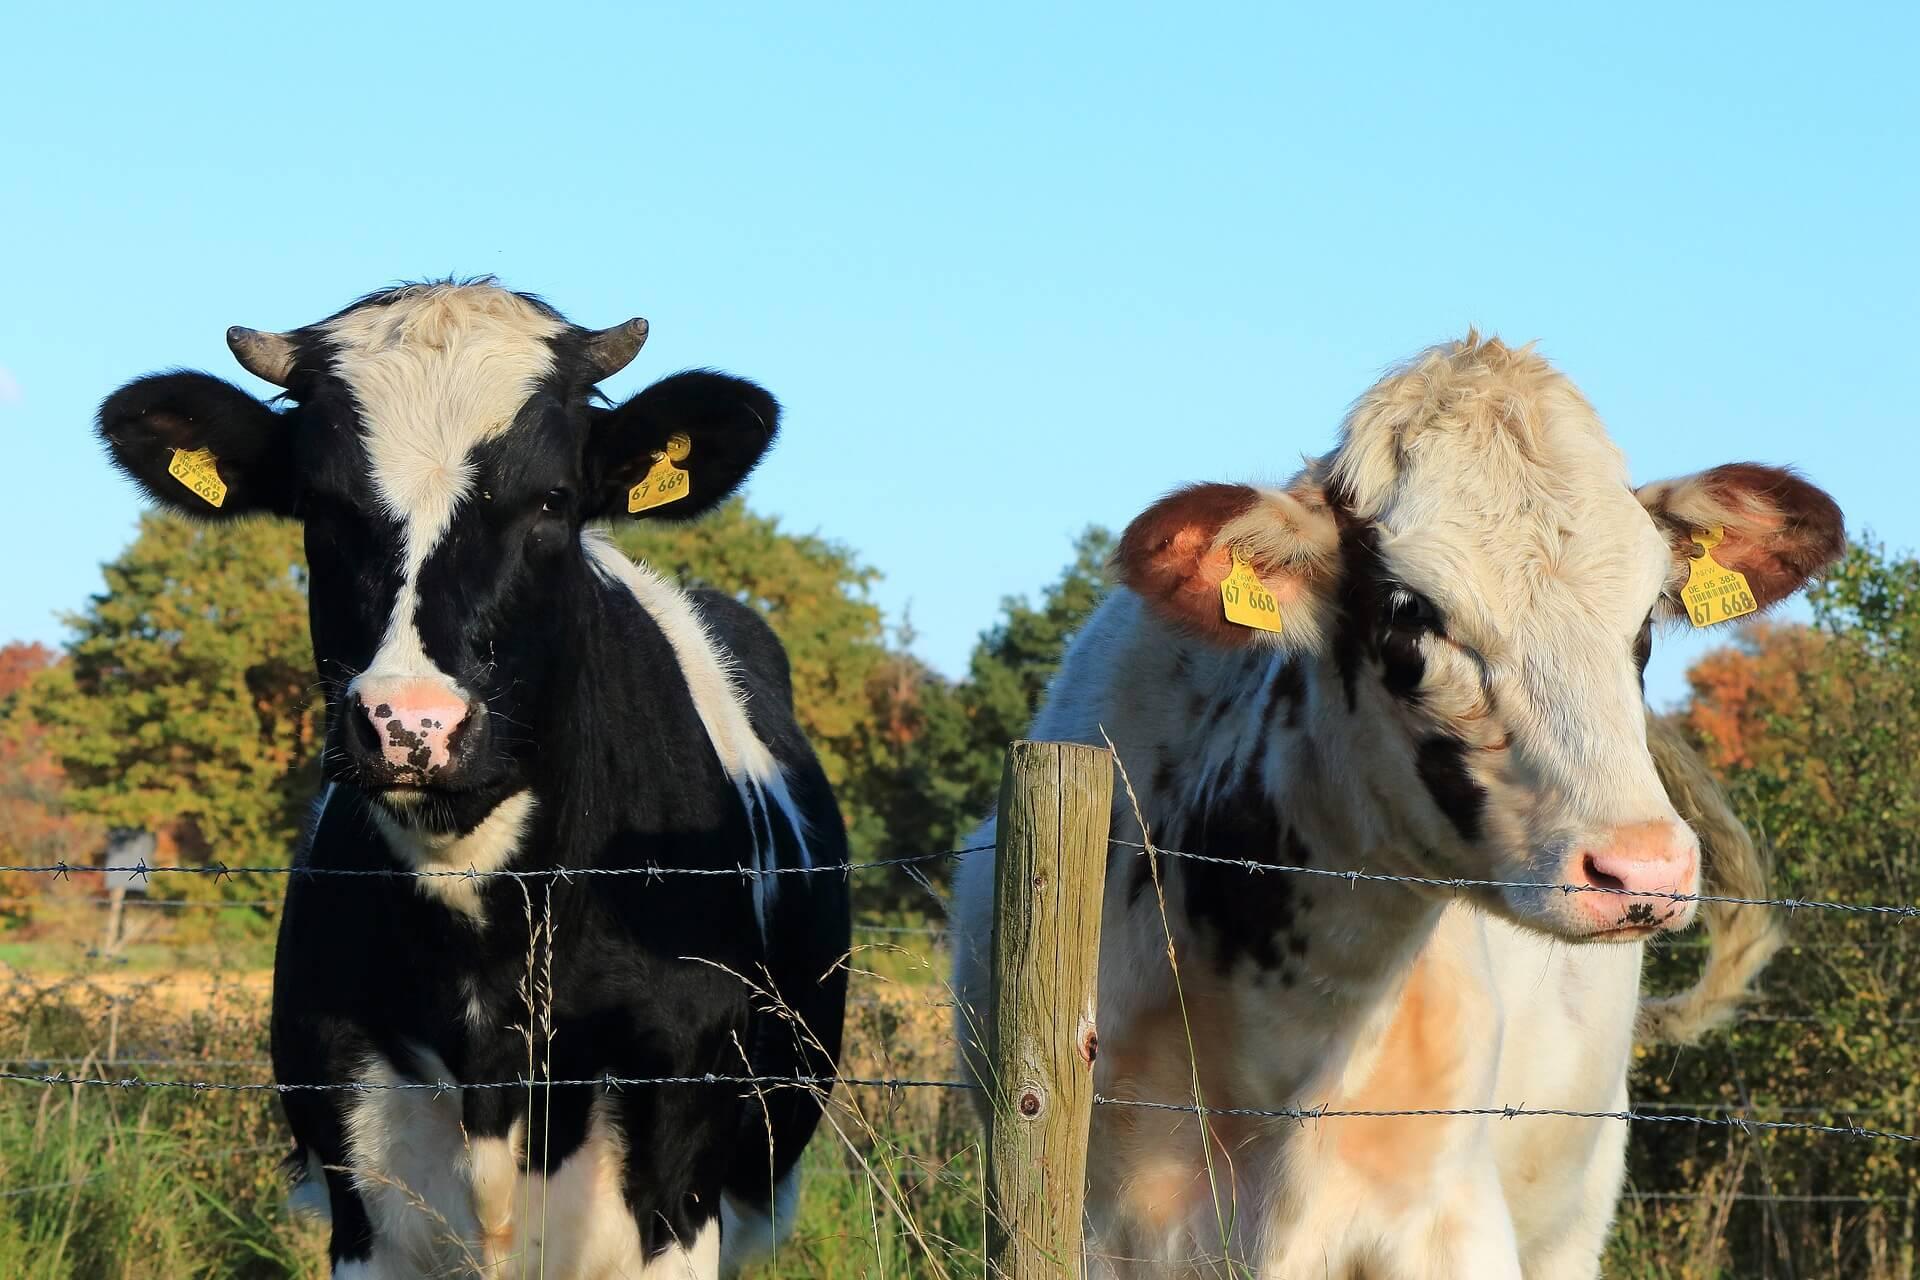 cow-1557077_1920